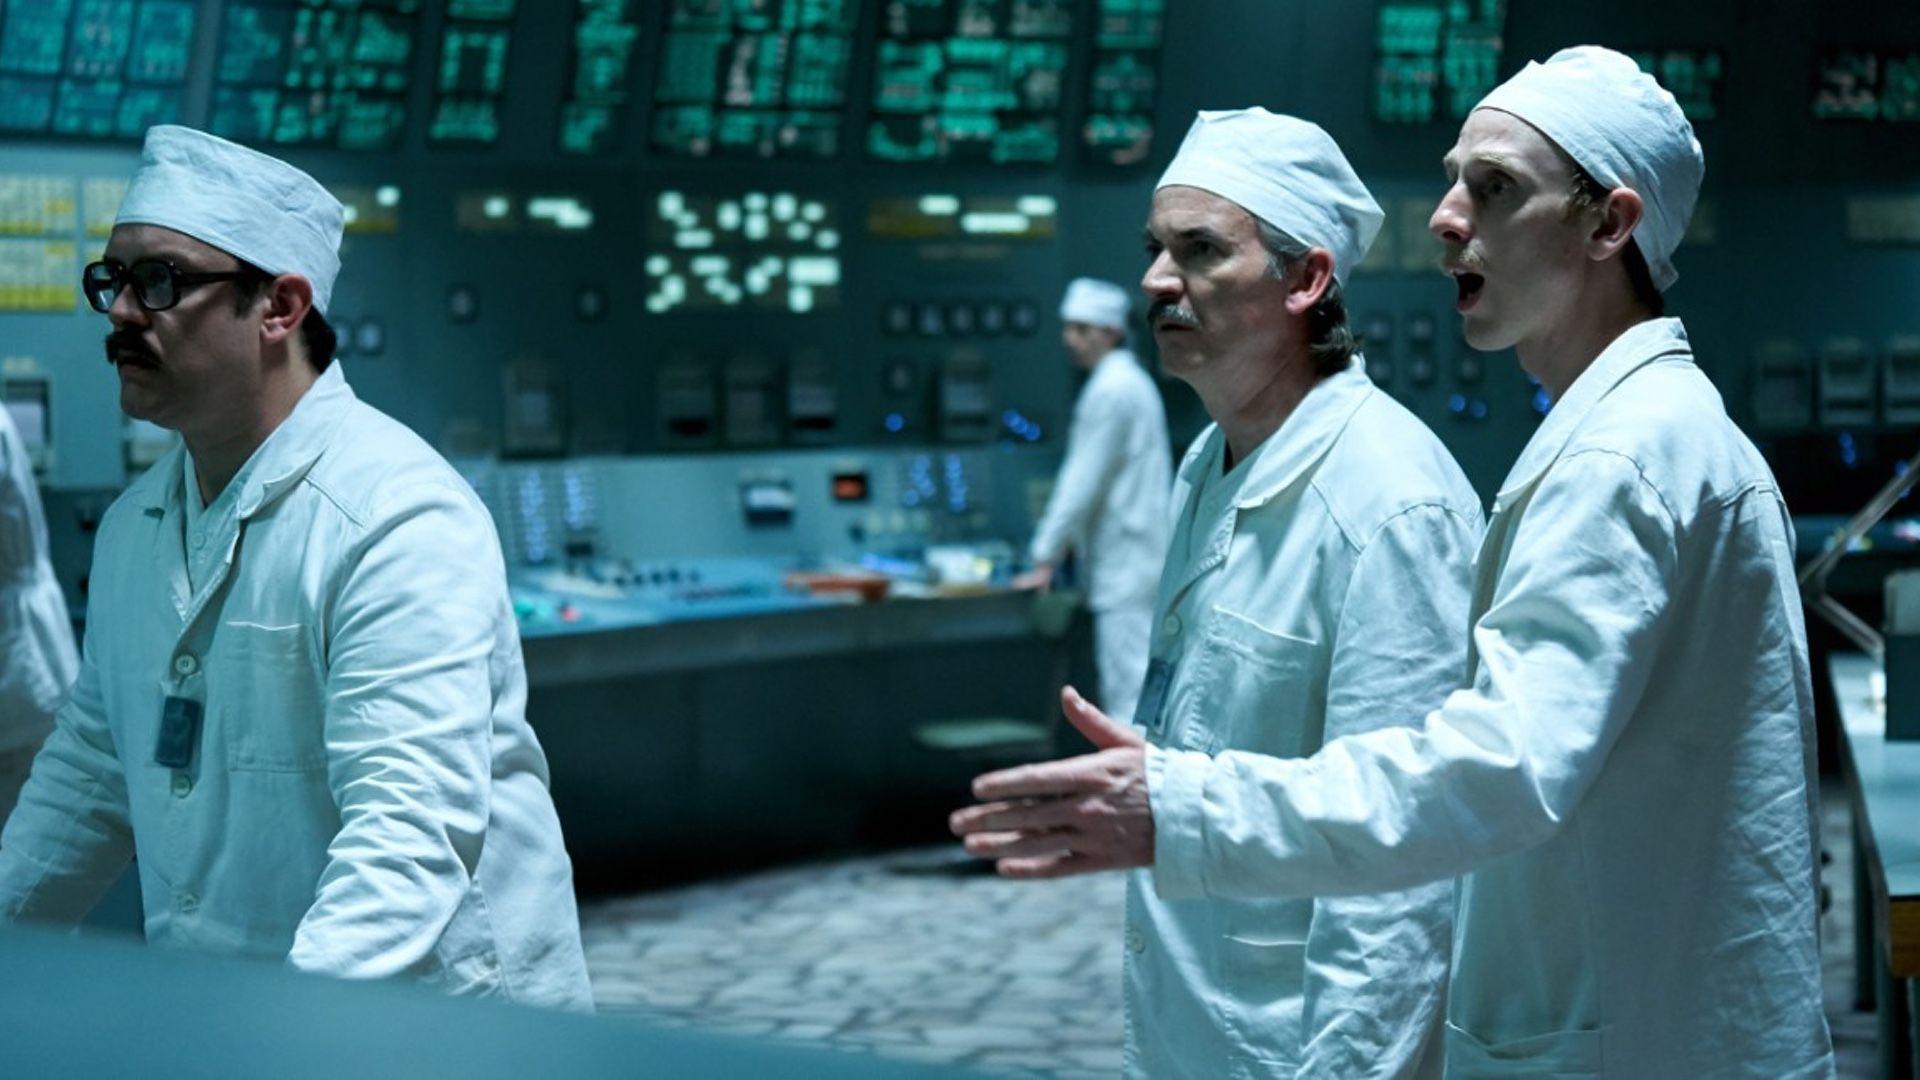 Nightmarish Full Trailer For Hbo S Nuclear Disaster Miniseries